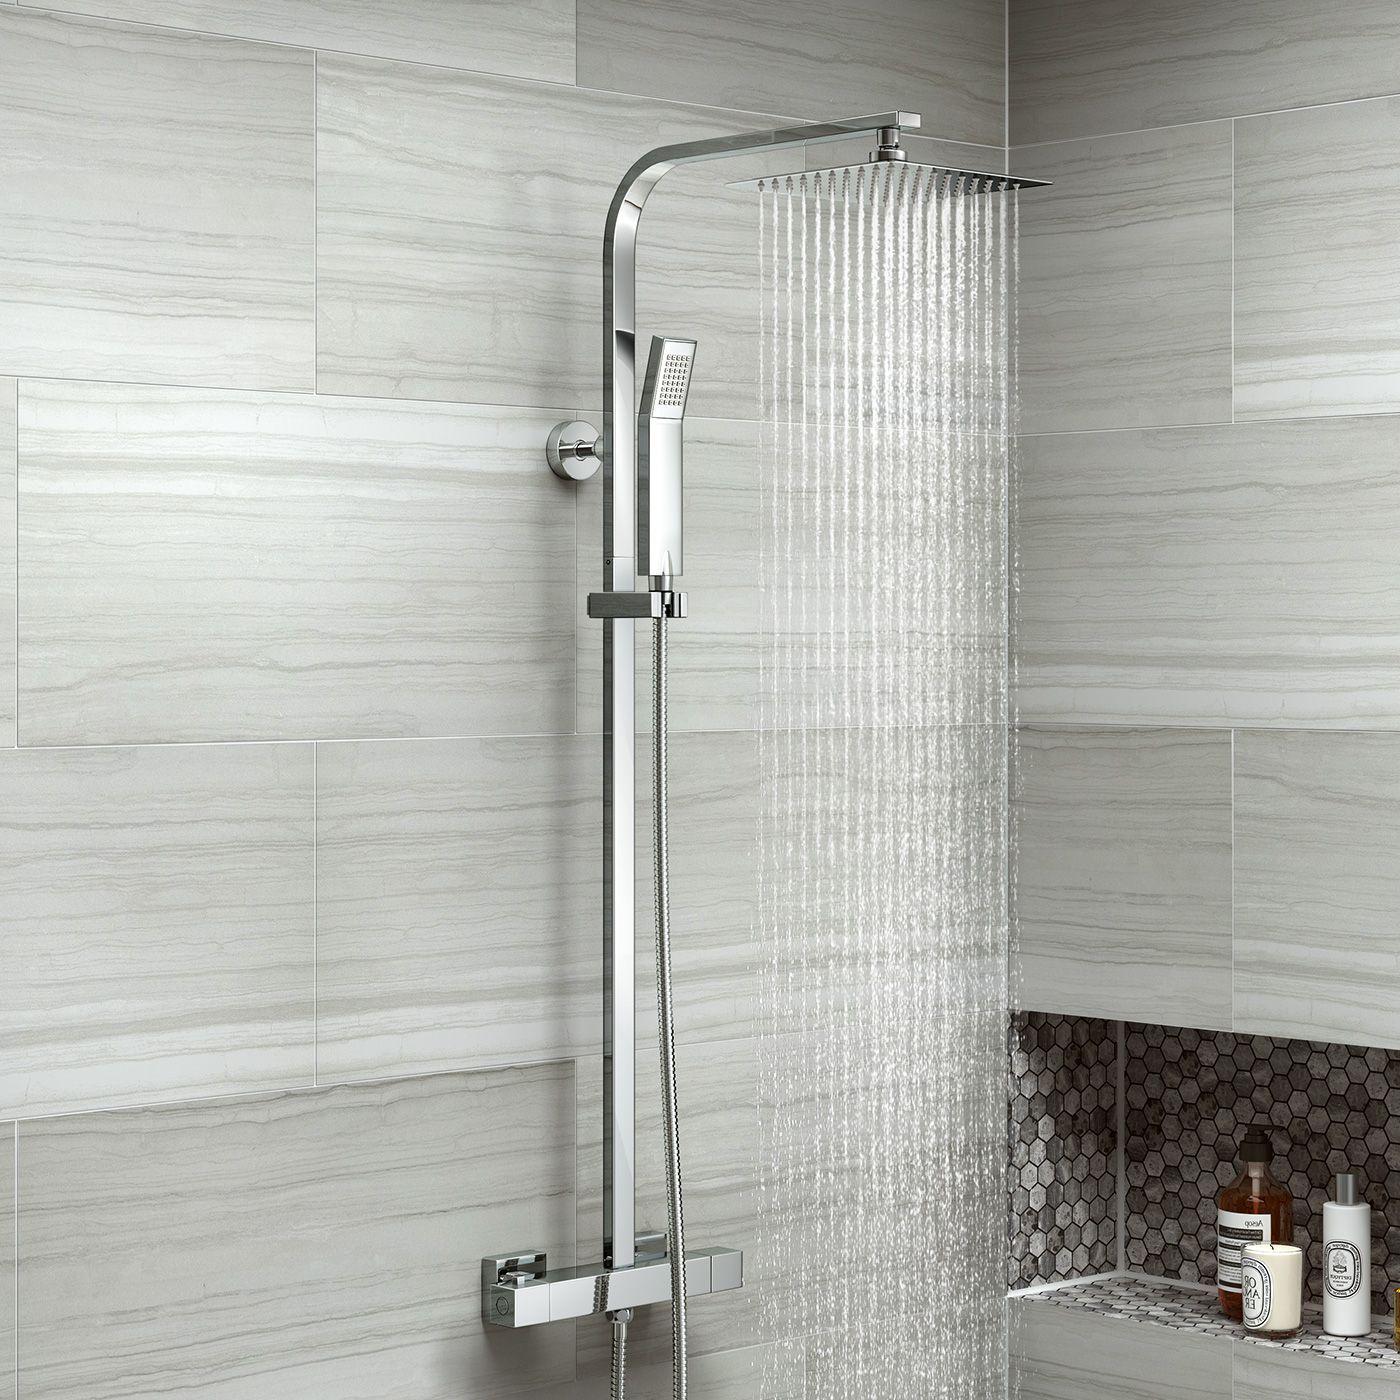 200mm Square Head Thermostatic Exposed Shower Kit - soak.com | Loft ...